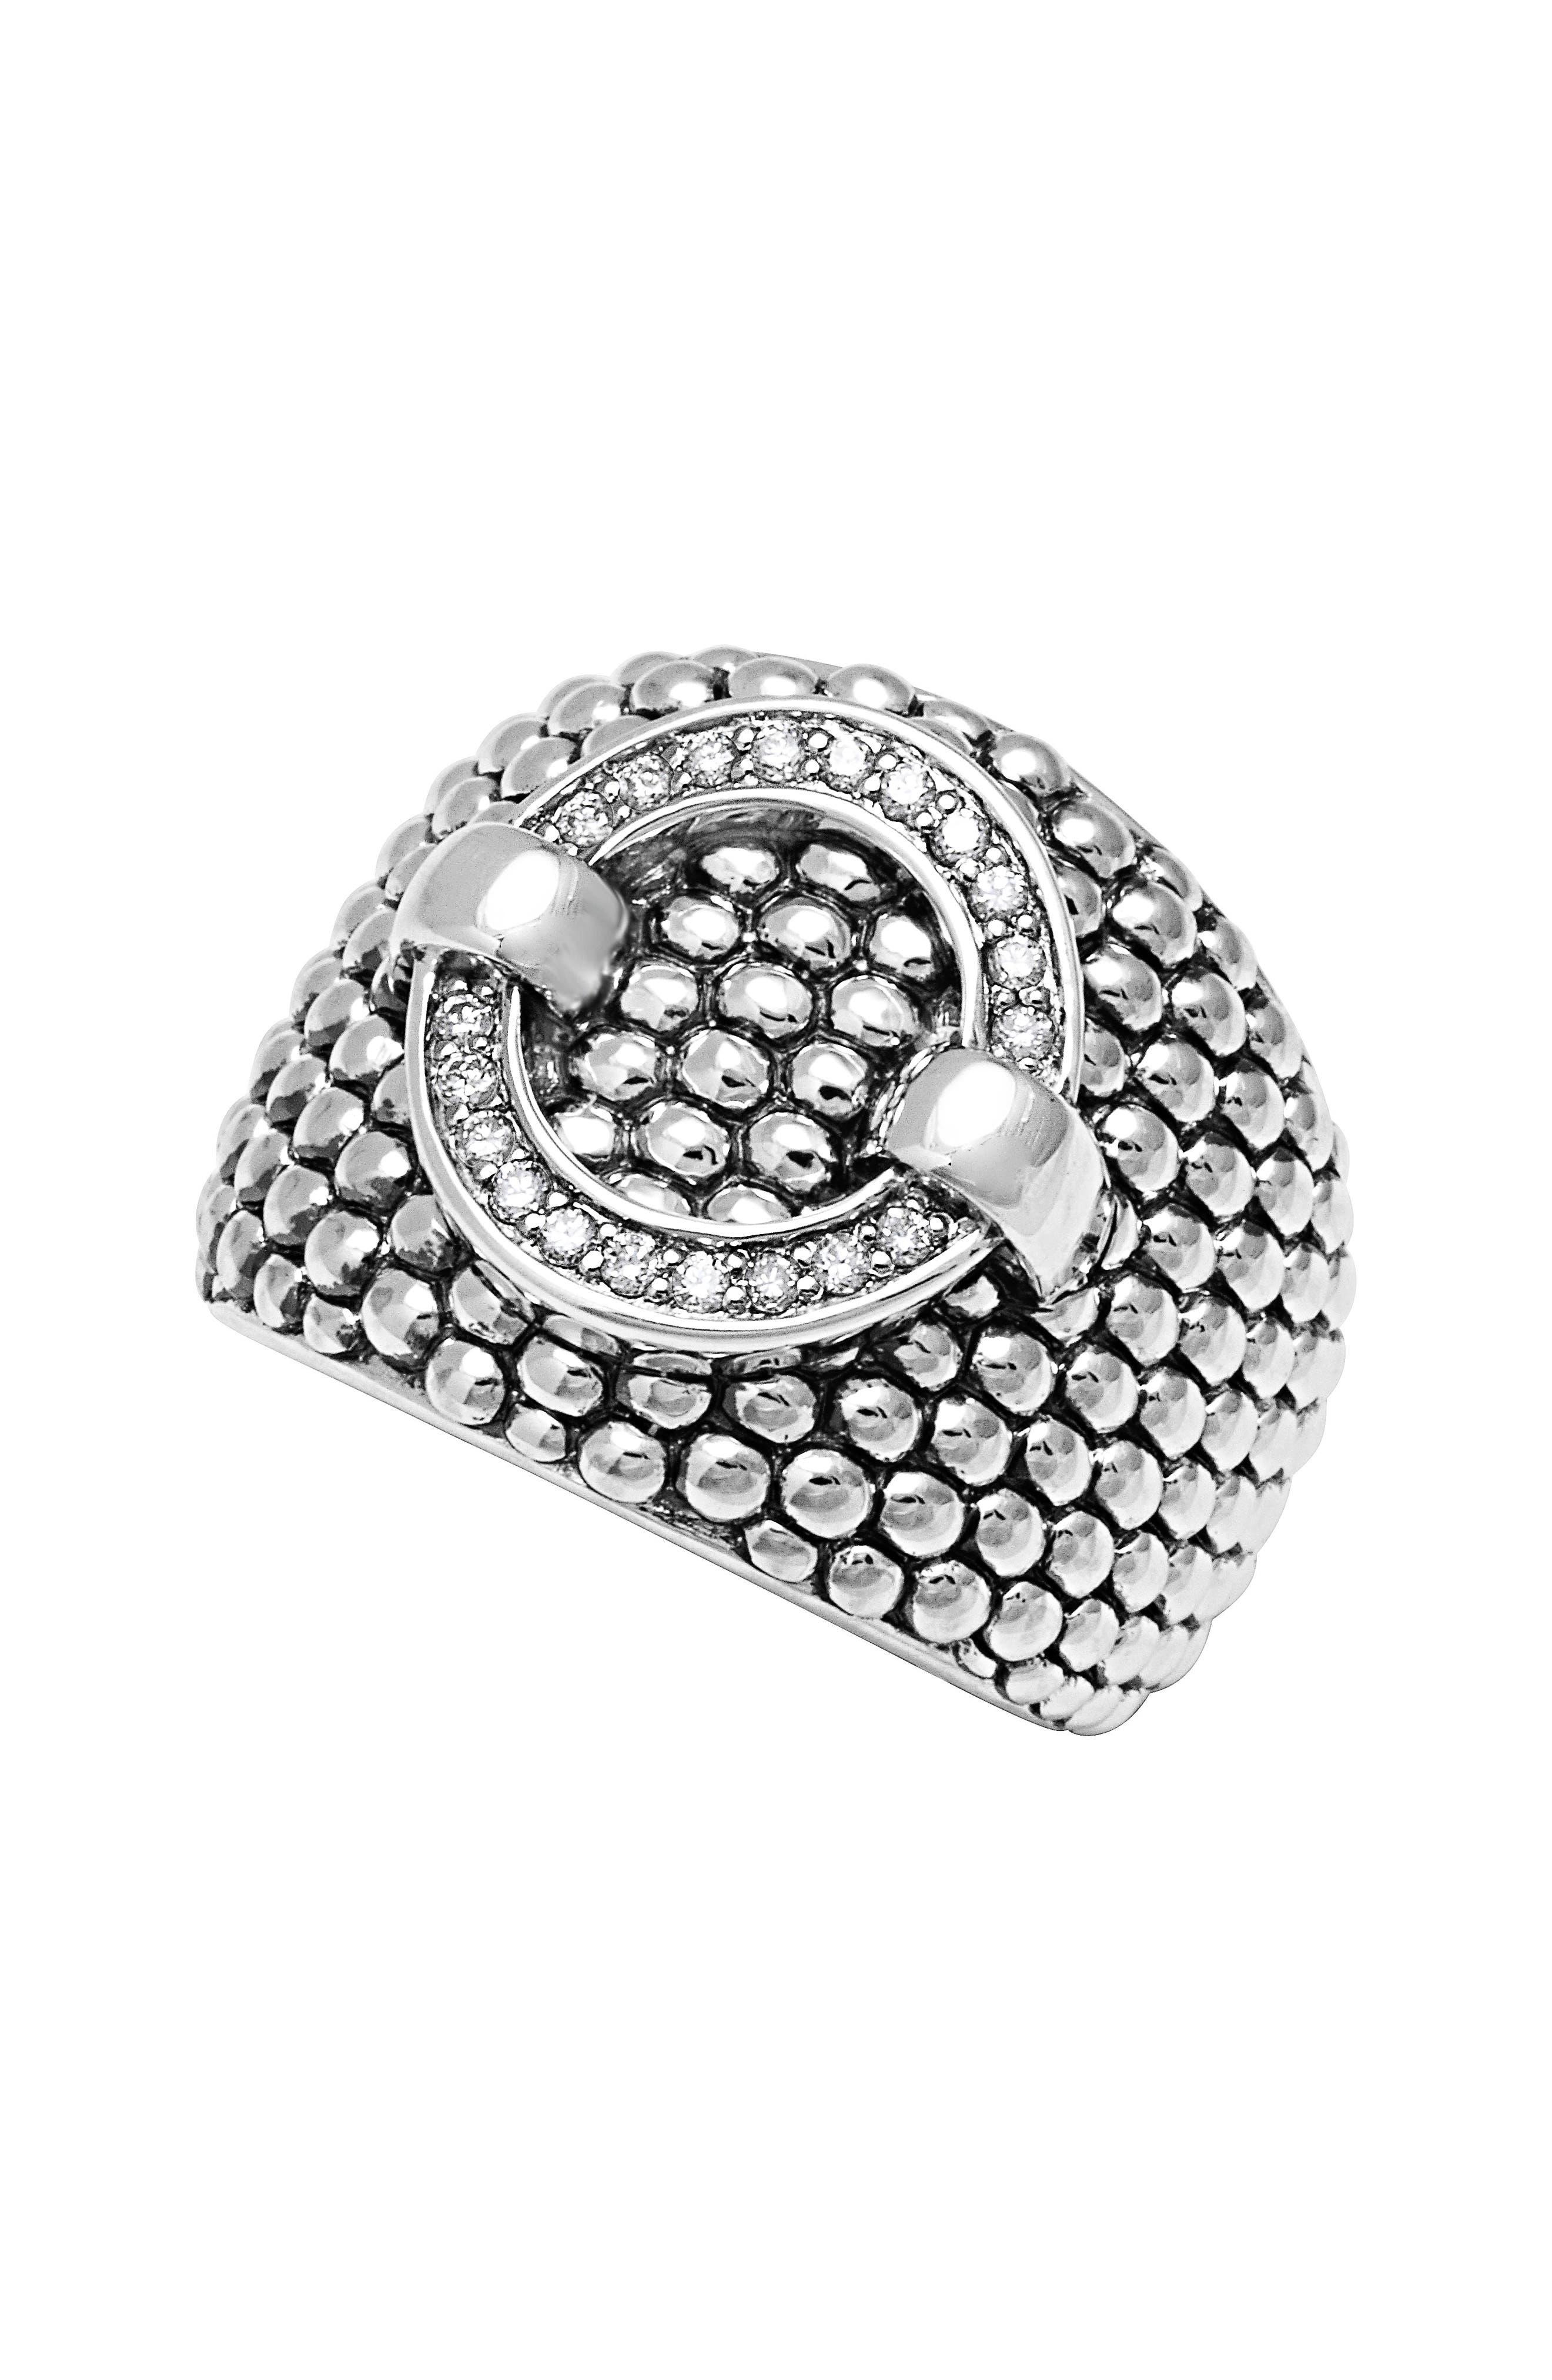 Alternate Image 1 Selected - LAGOS 'Enso' Diamond Statement Ring